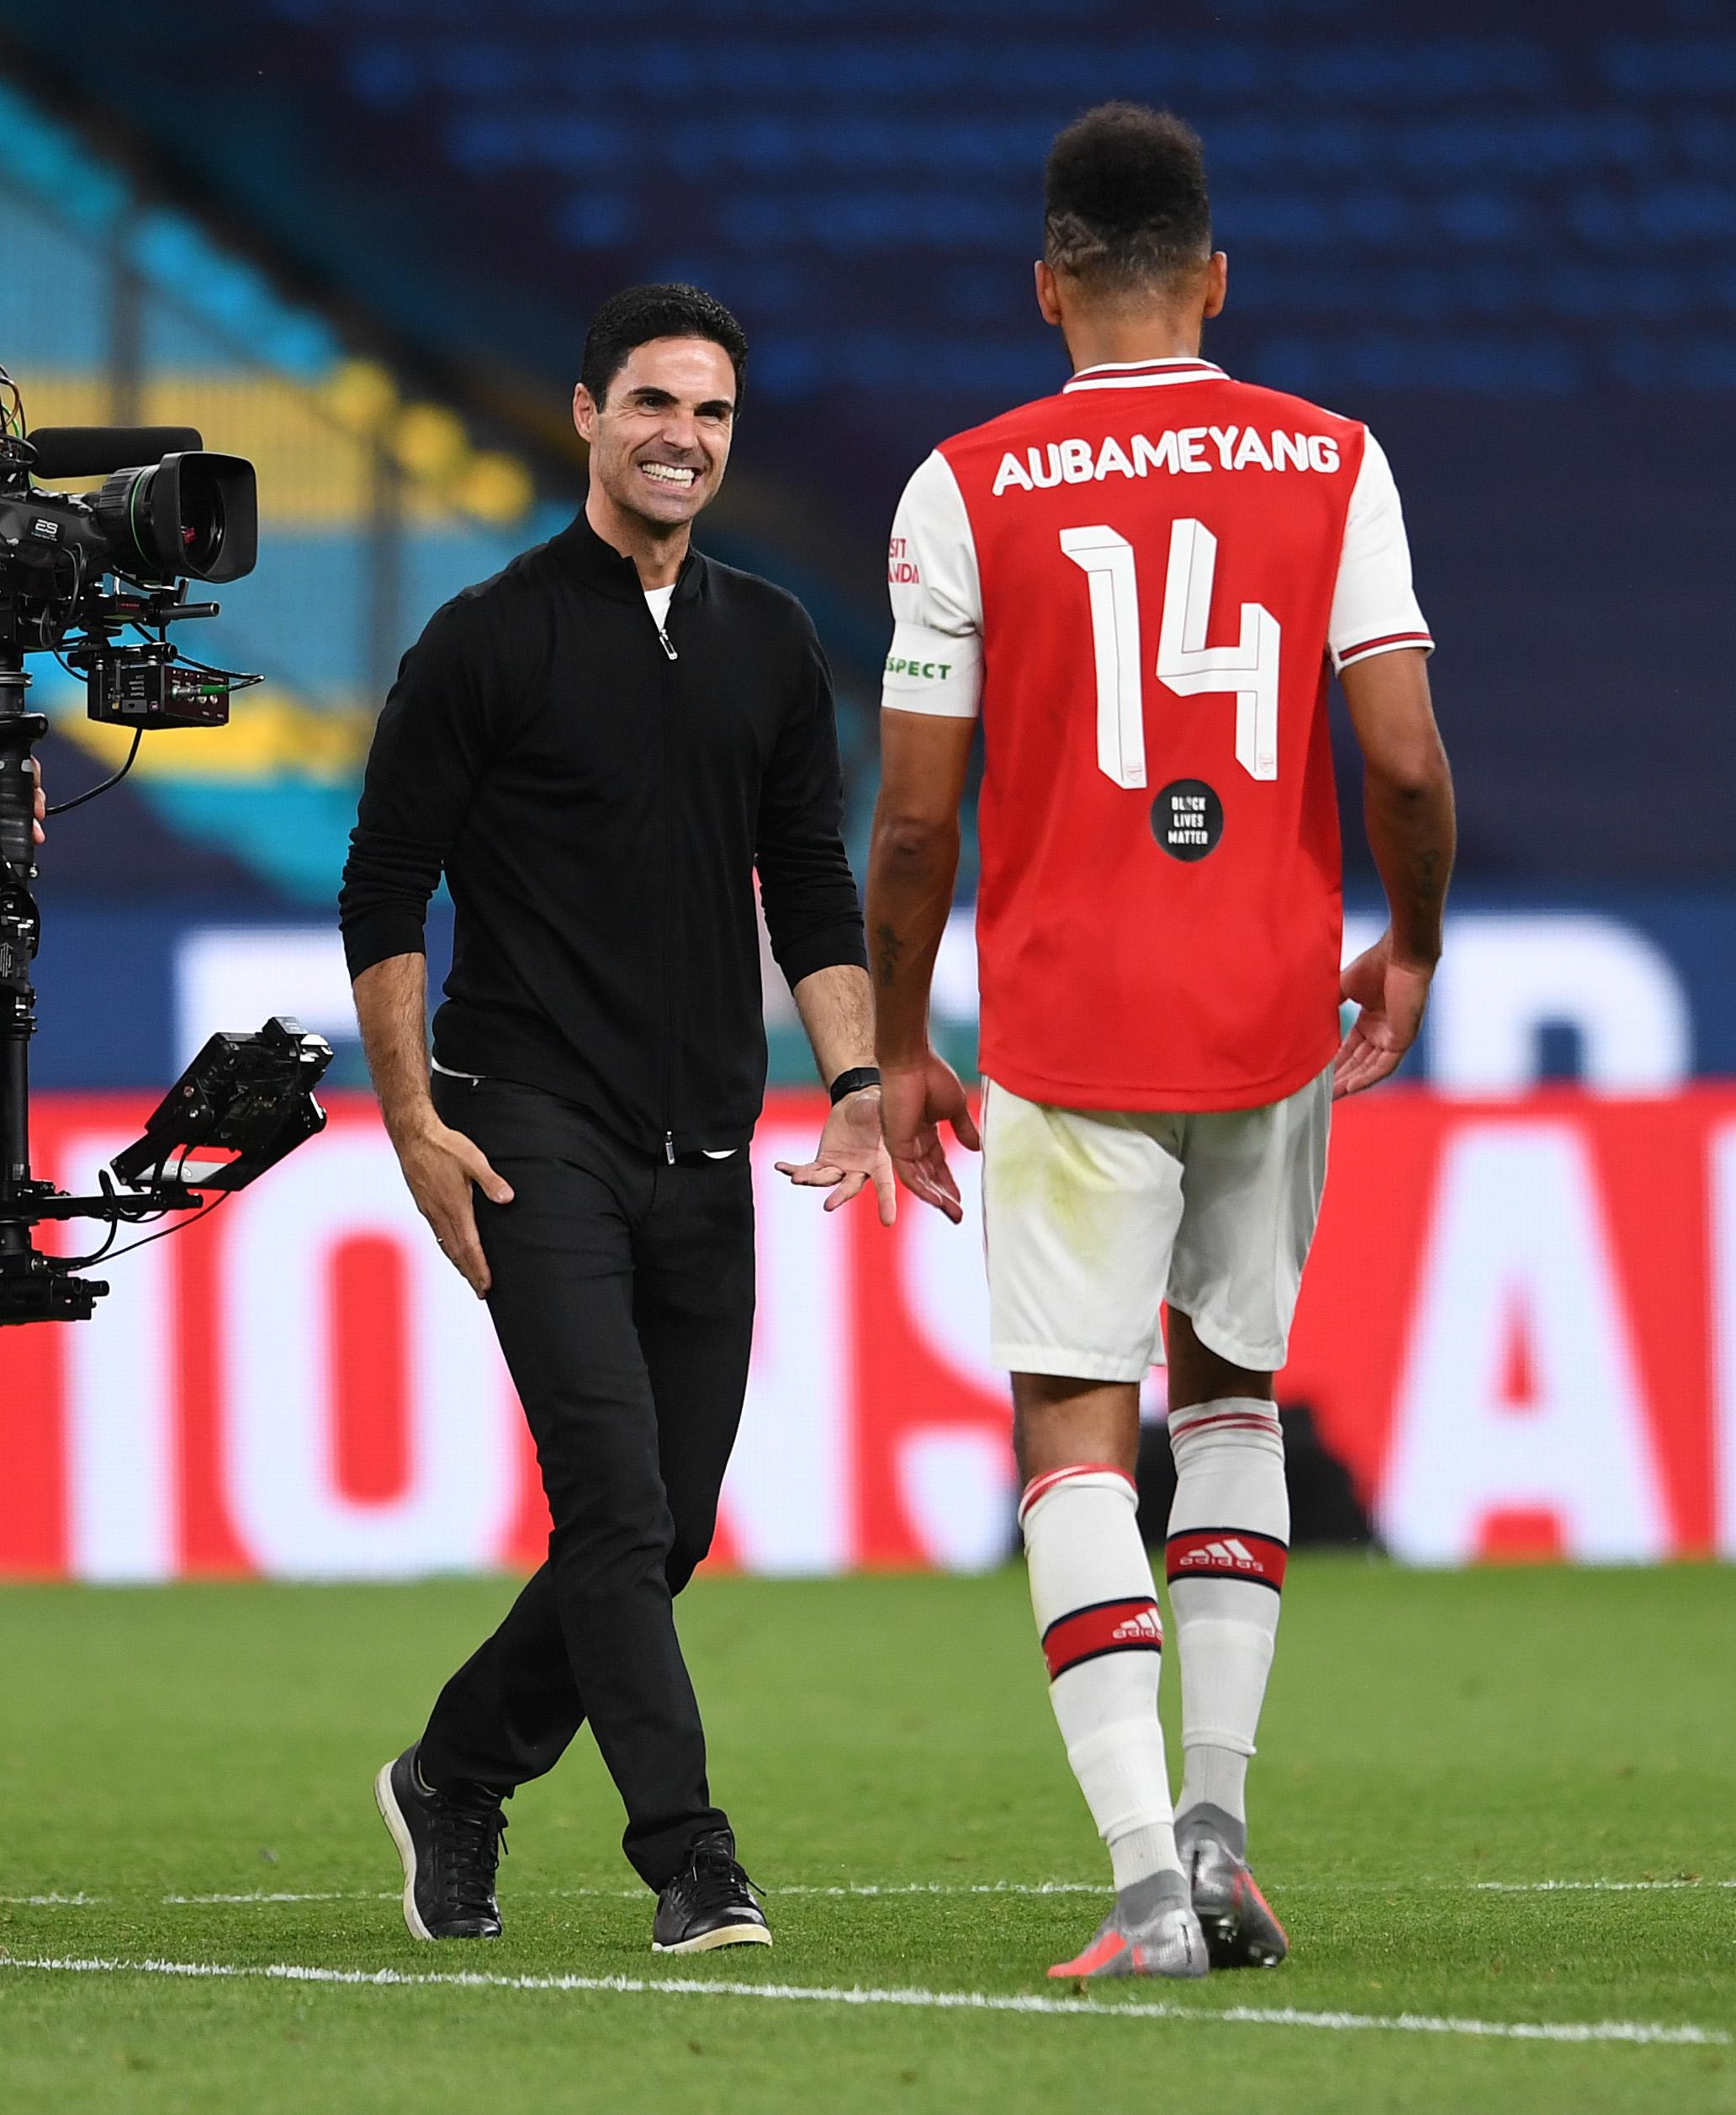 Arsenal news: Mikel Arteta provides positive update on Pierre-Emerick Aubameyang's future thumbnail